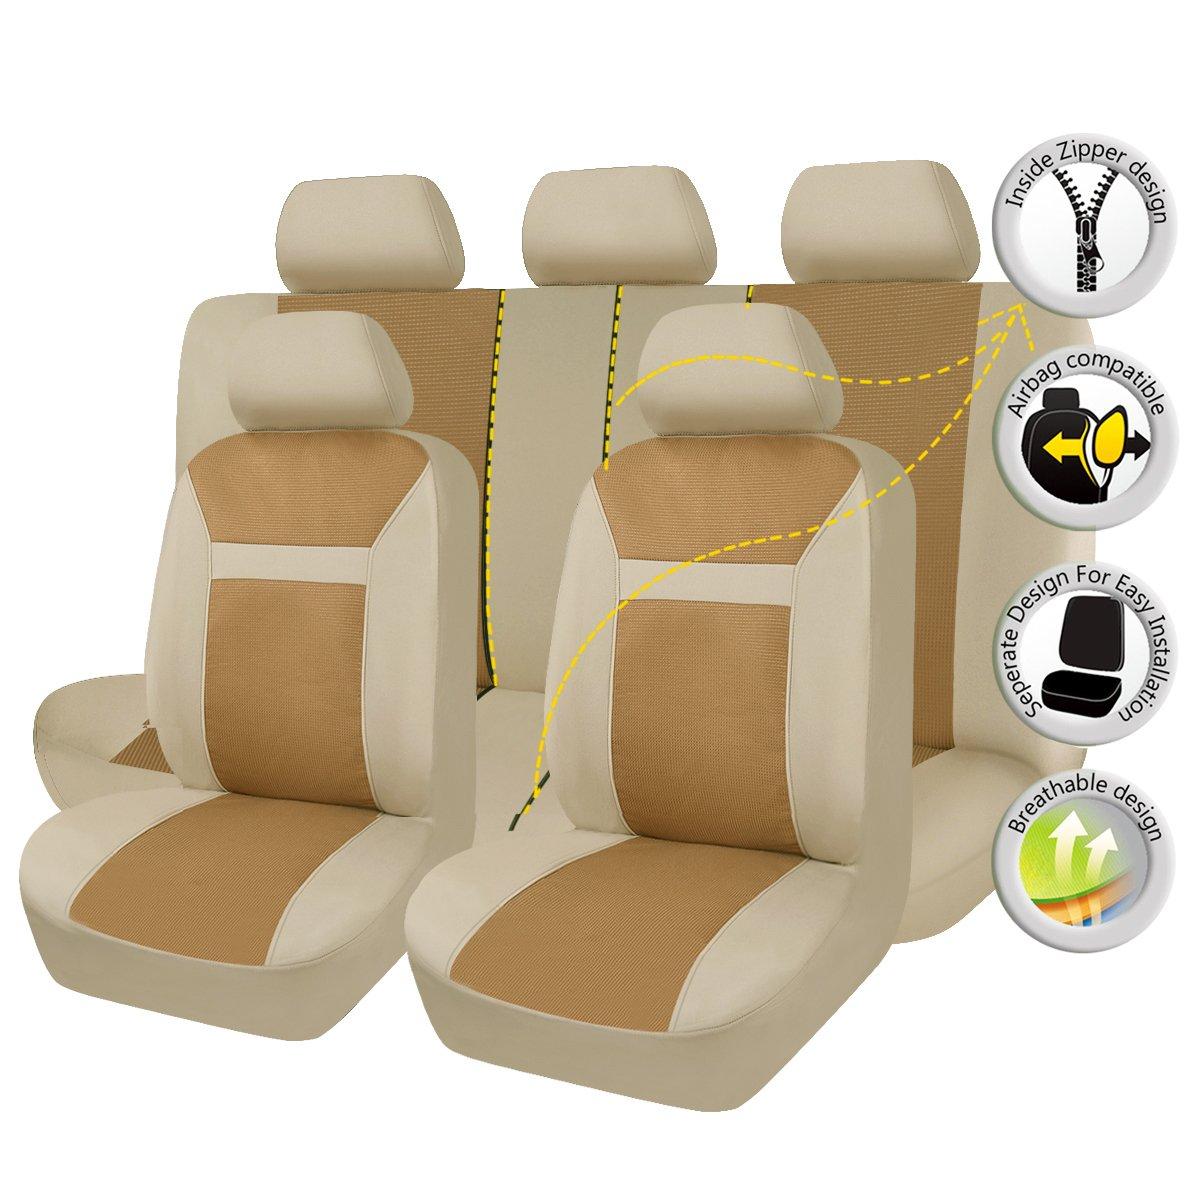 FlyingBanner Maschen und Jacquard Universal fü r Auto Sitzbezü ge Mit Seitenairbags (Beige) Ningbo Qiyang International Trade Co. Ltd FB-104015-0303